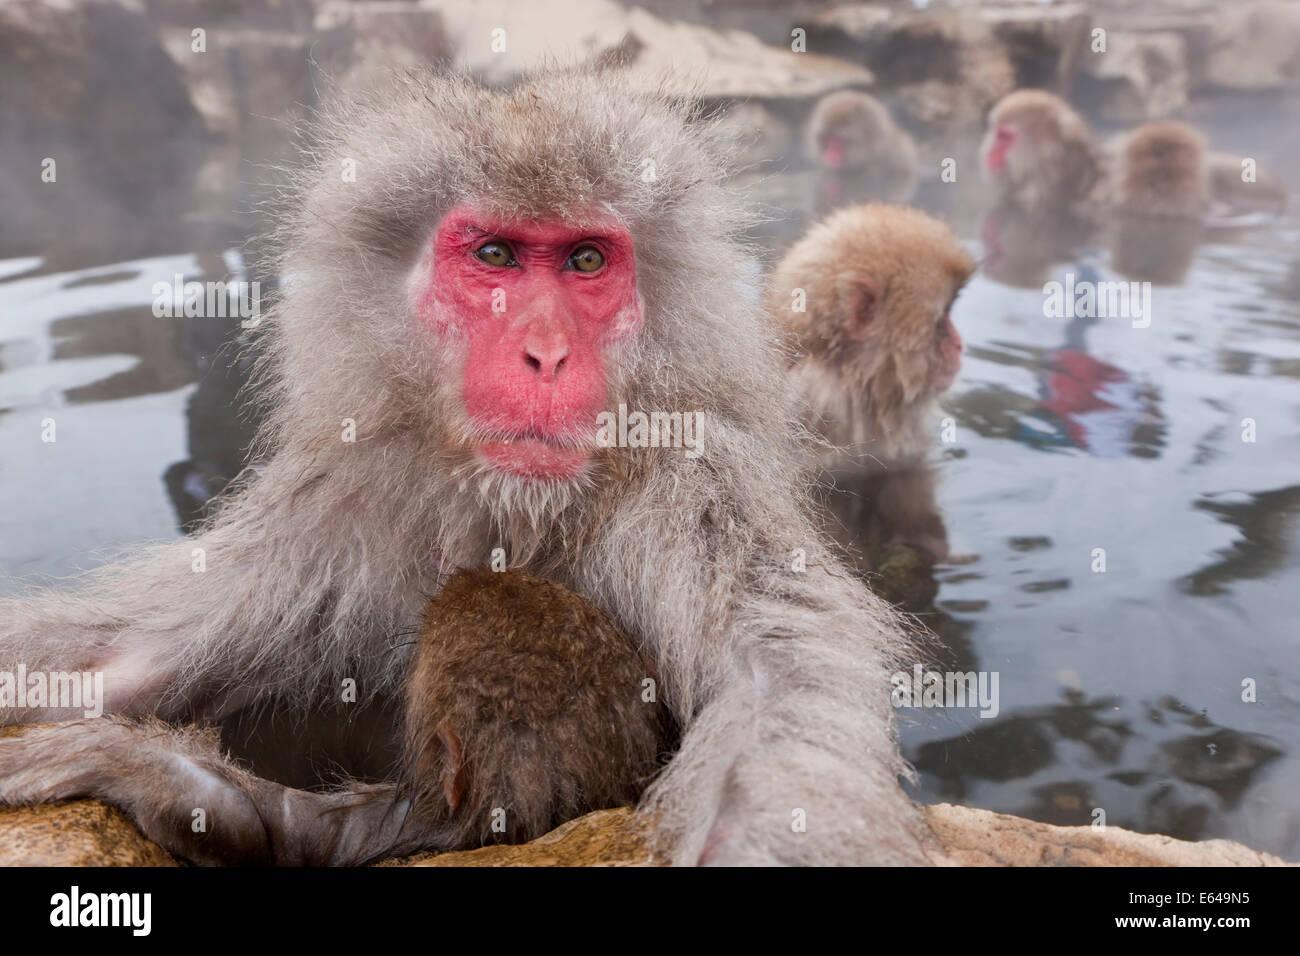 Japanischen Makaken (Macaca Fuscata) / Snow Monkey, Joshin-Etsu Nationalpark, Honshu, Japan Stockbild